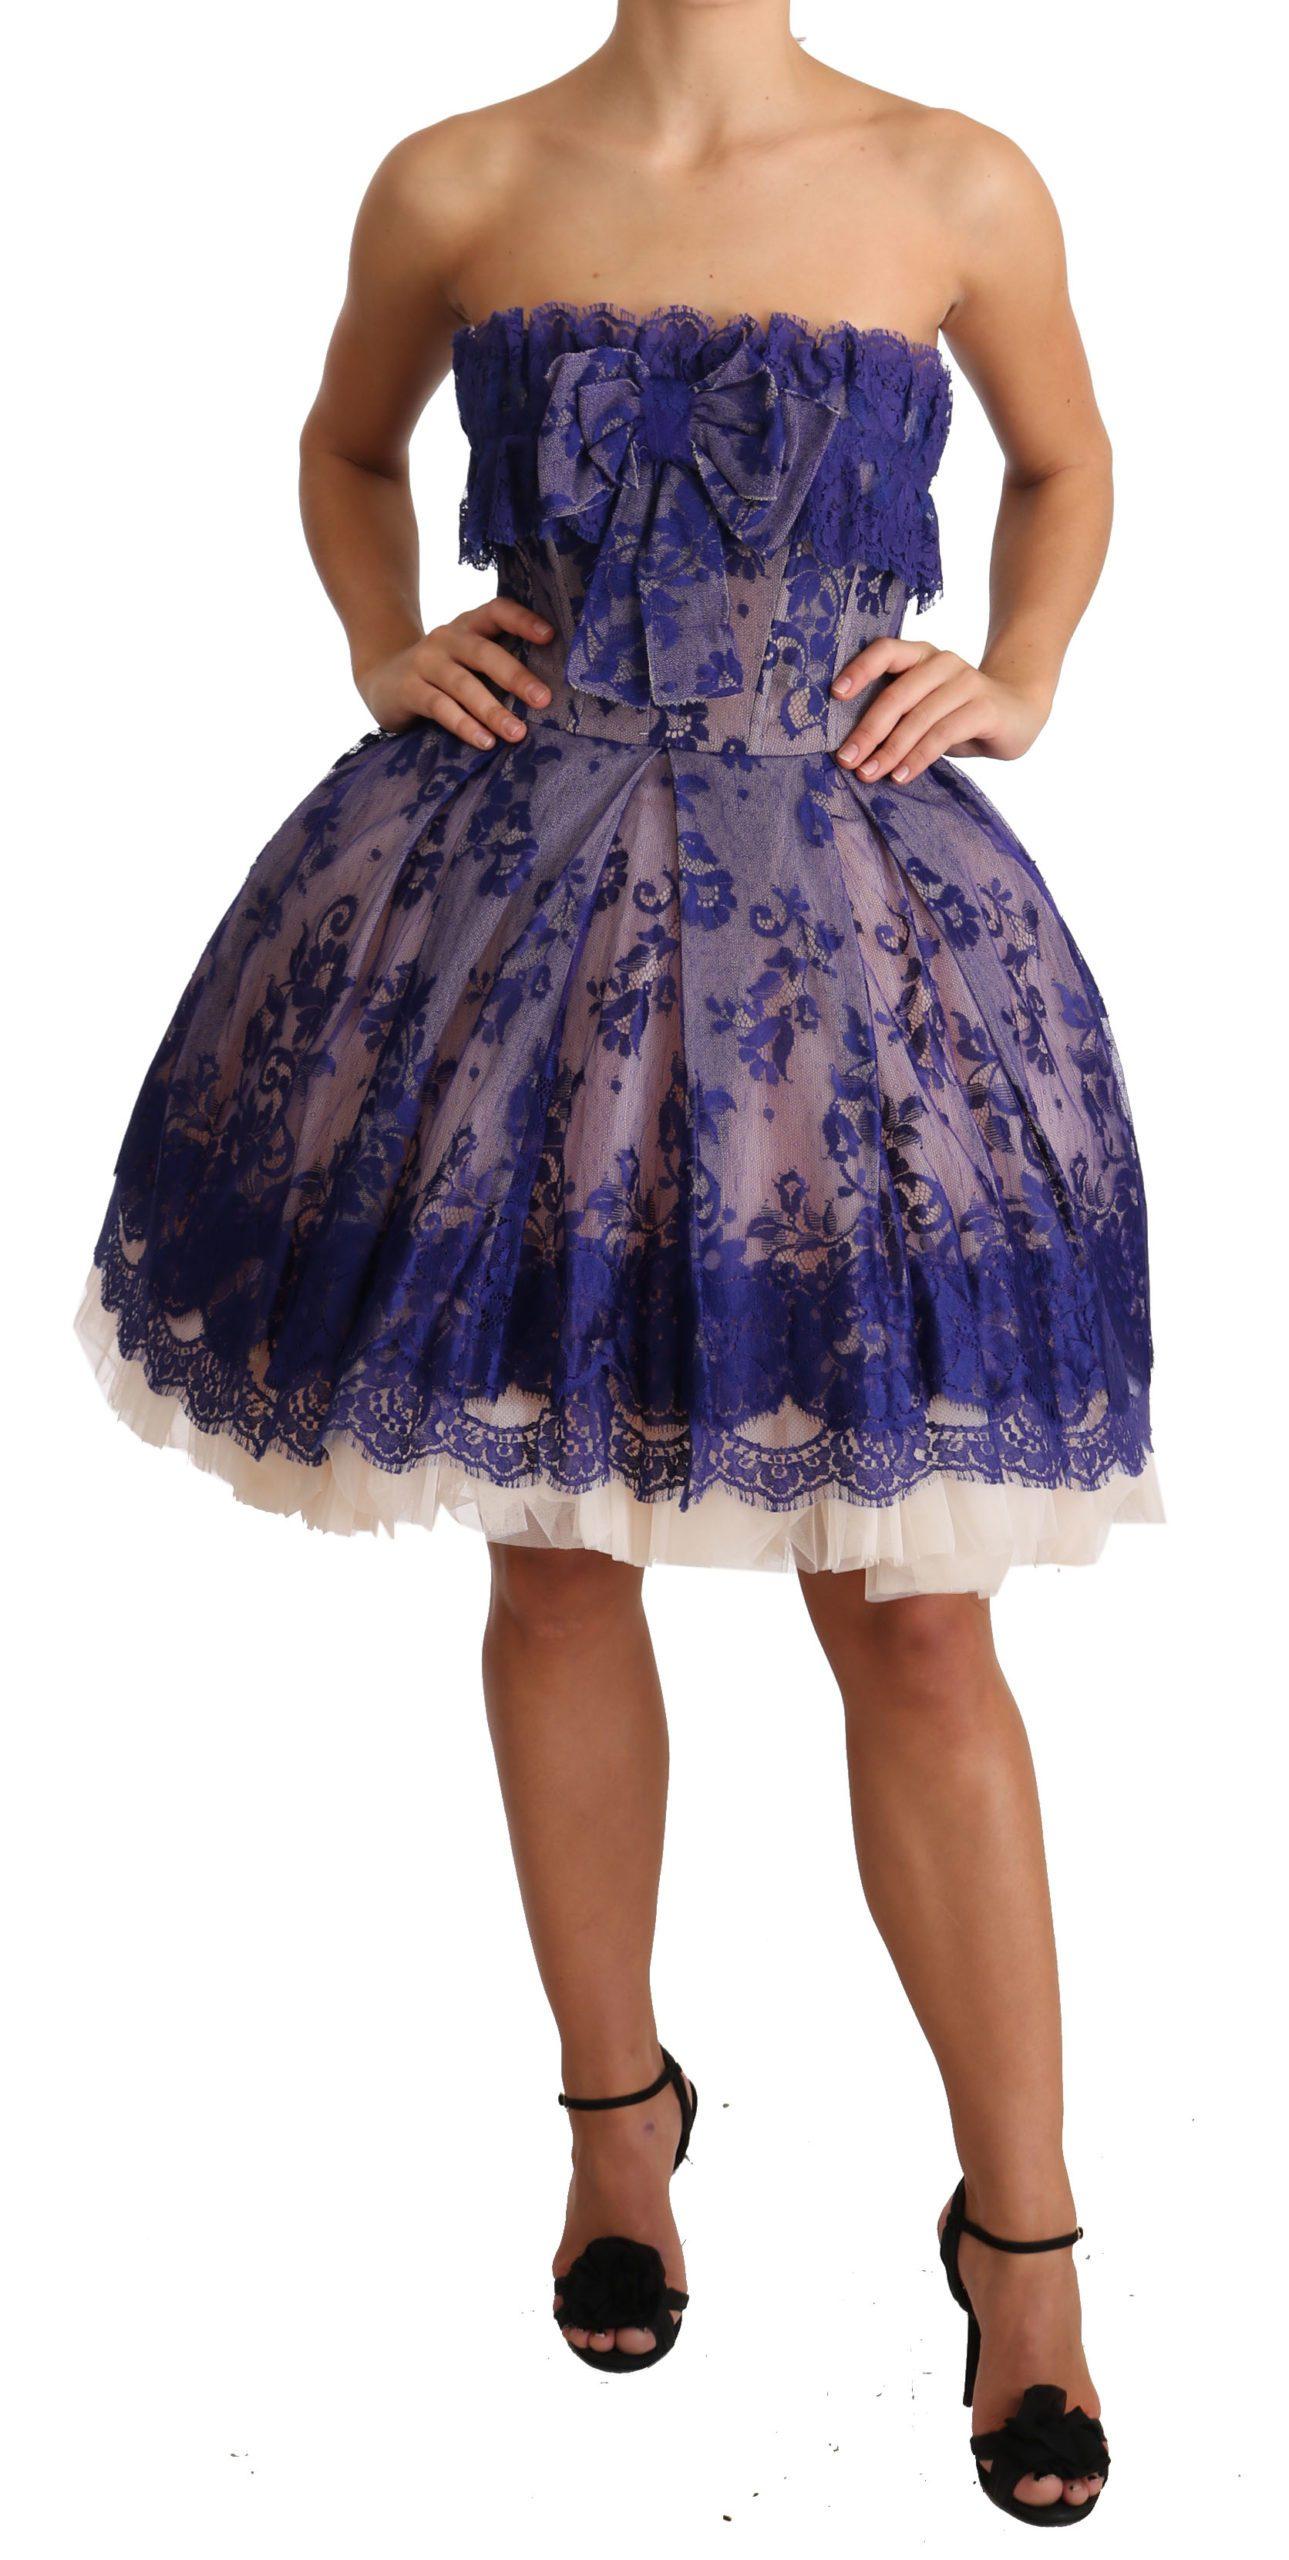 Dolce & Gabbana Women's Lace Ballerina Tulle Strapless Dress Purple DR1919 - IT40|S